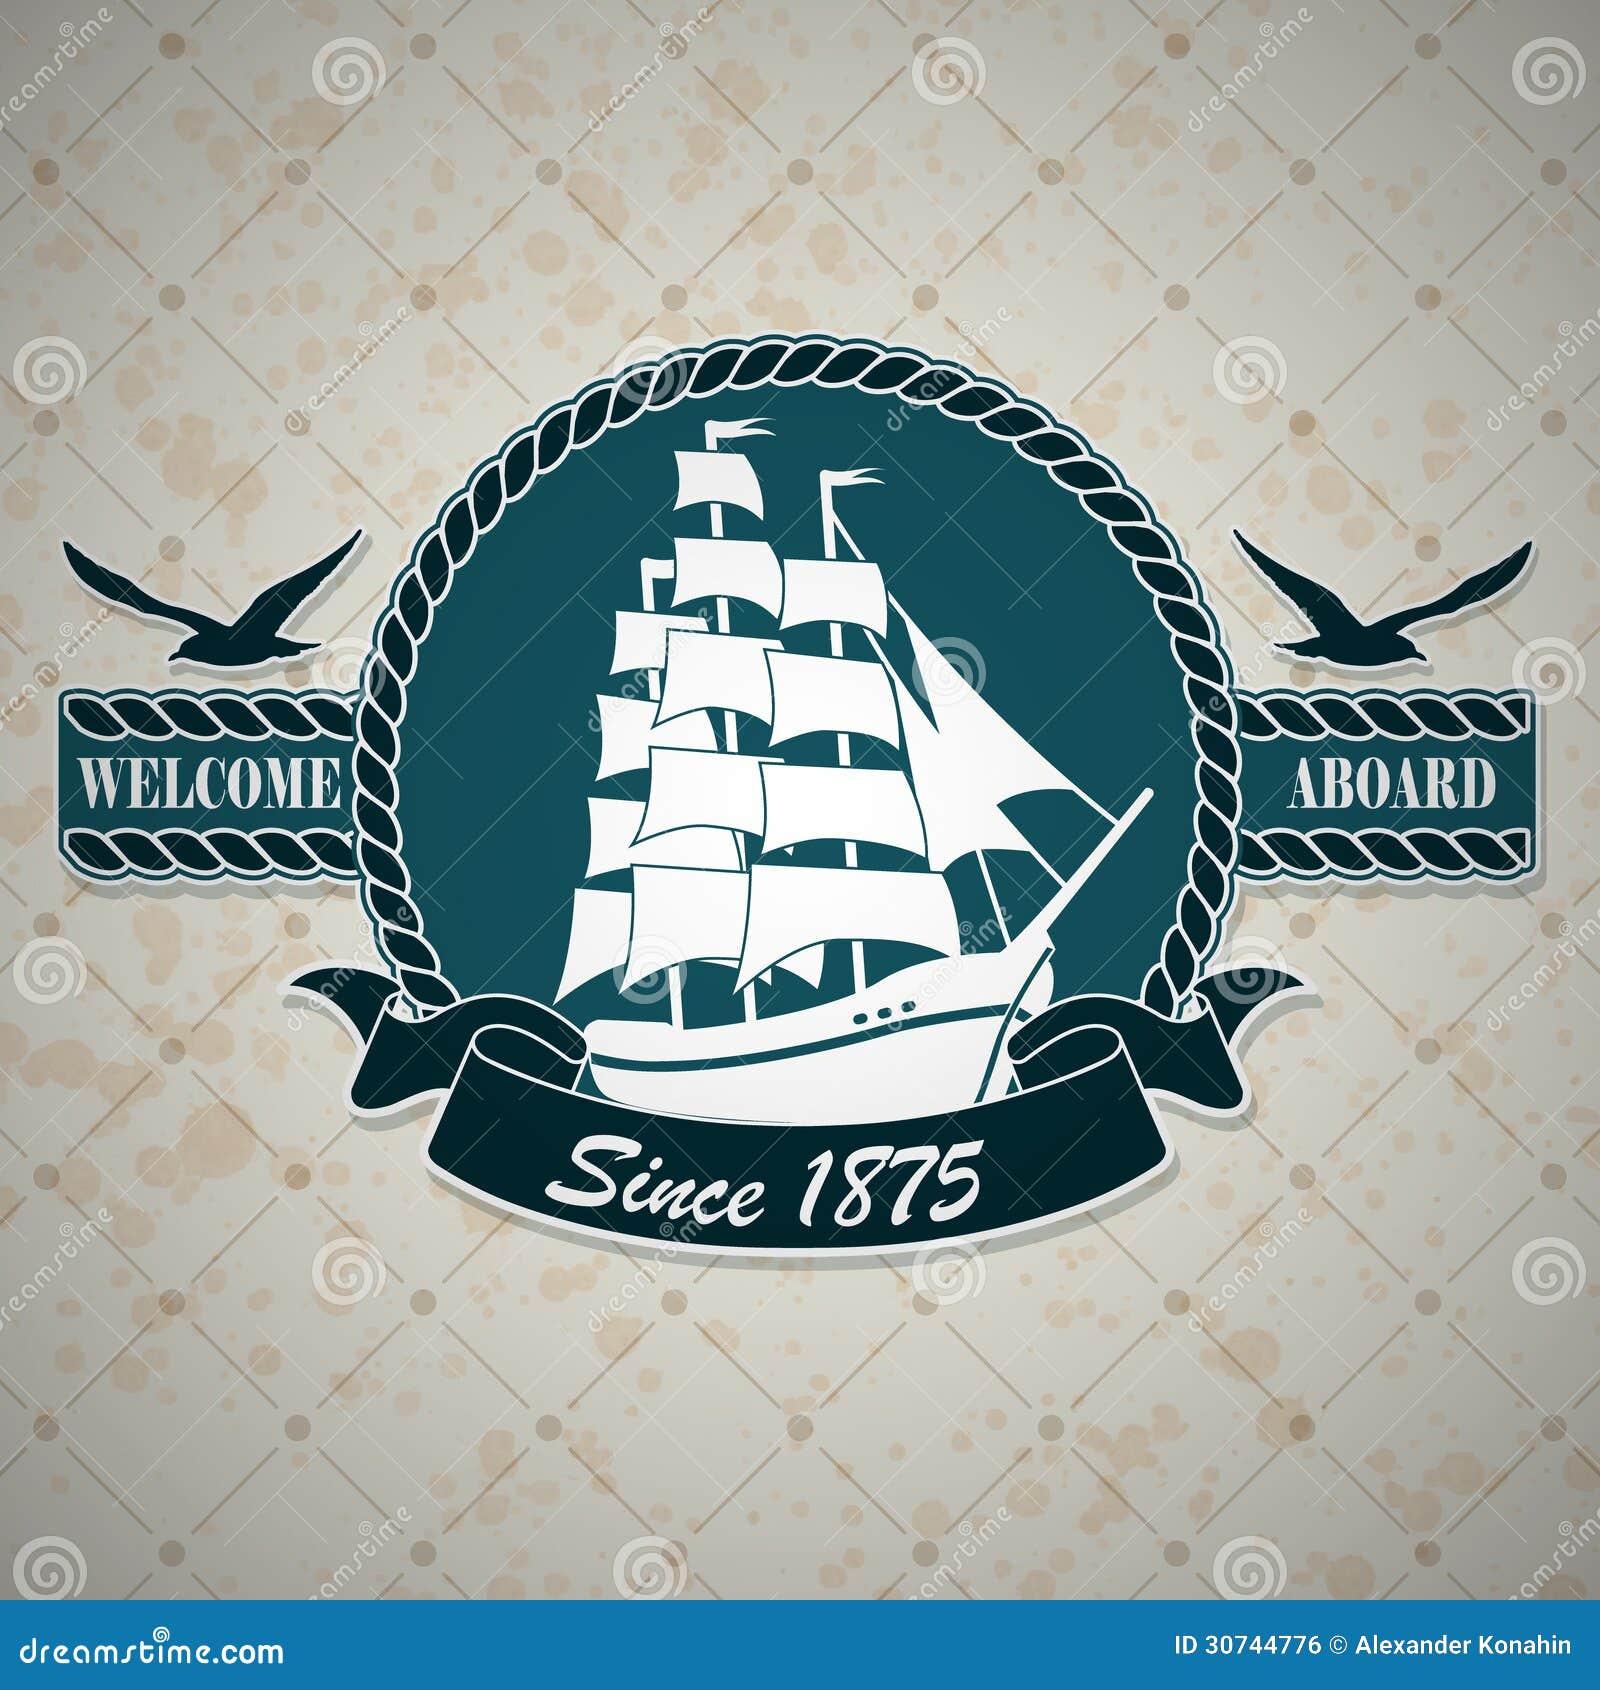 Design Nautical Theme vintage label with a nautical theme royalty free stock image photo